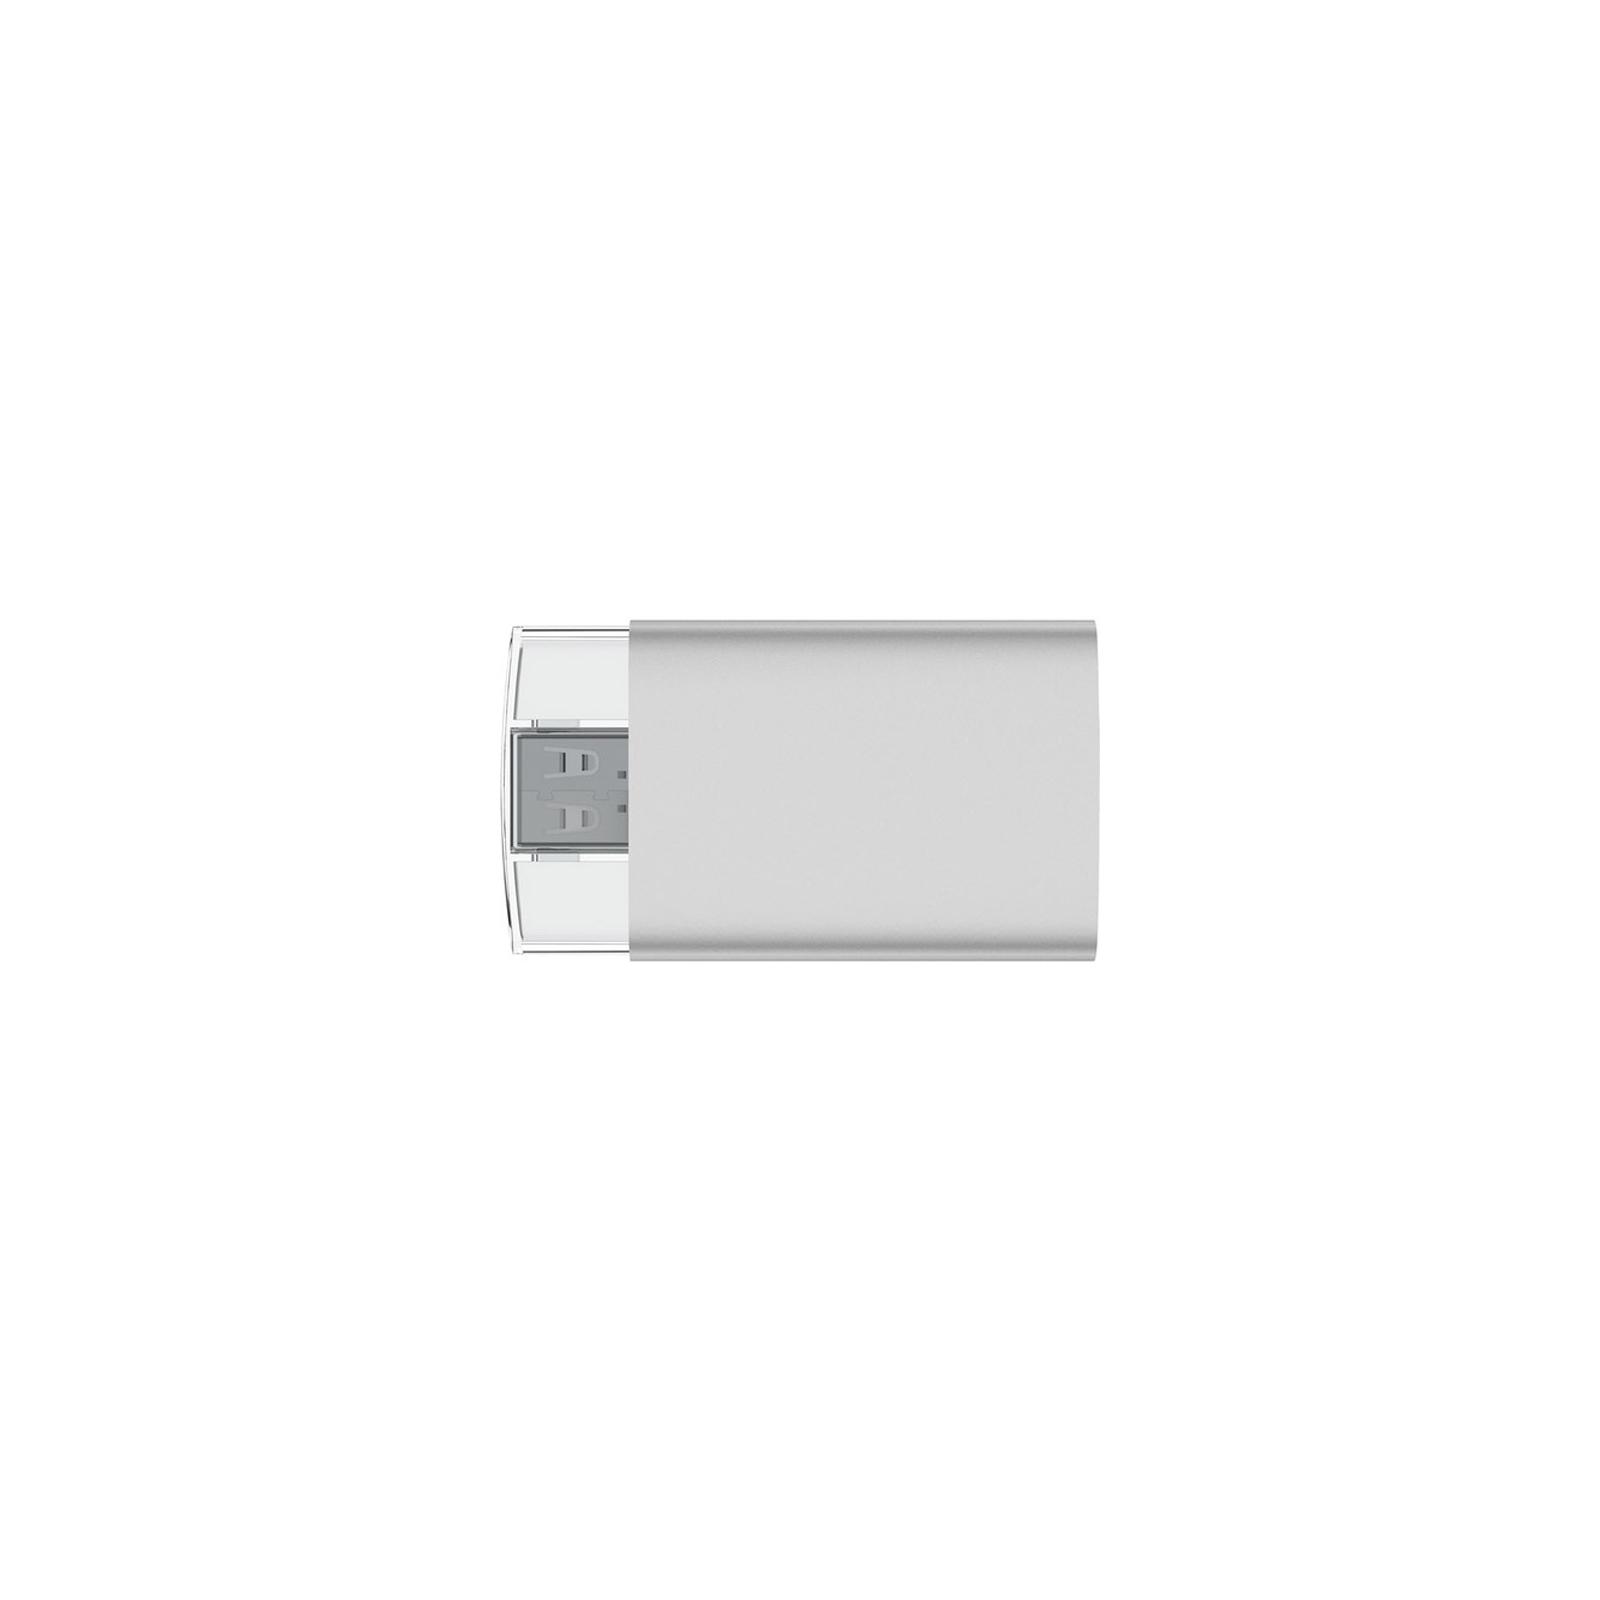 USB флеш накопитель SanDisk 64GB iXpand USB/Lightning Apple (SDIX-064G-G57) изображение 2